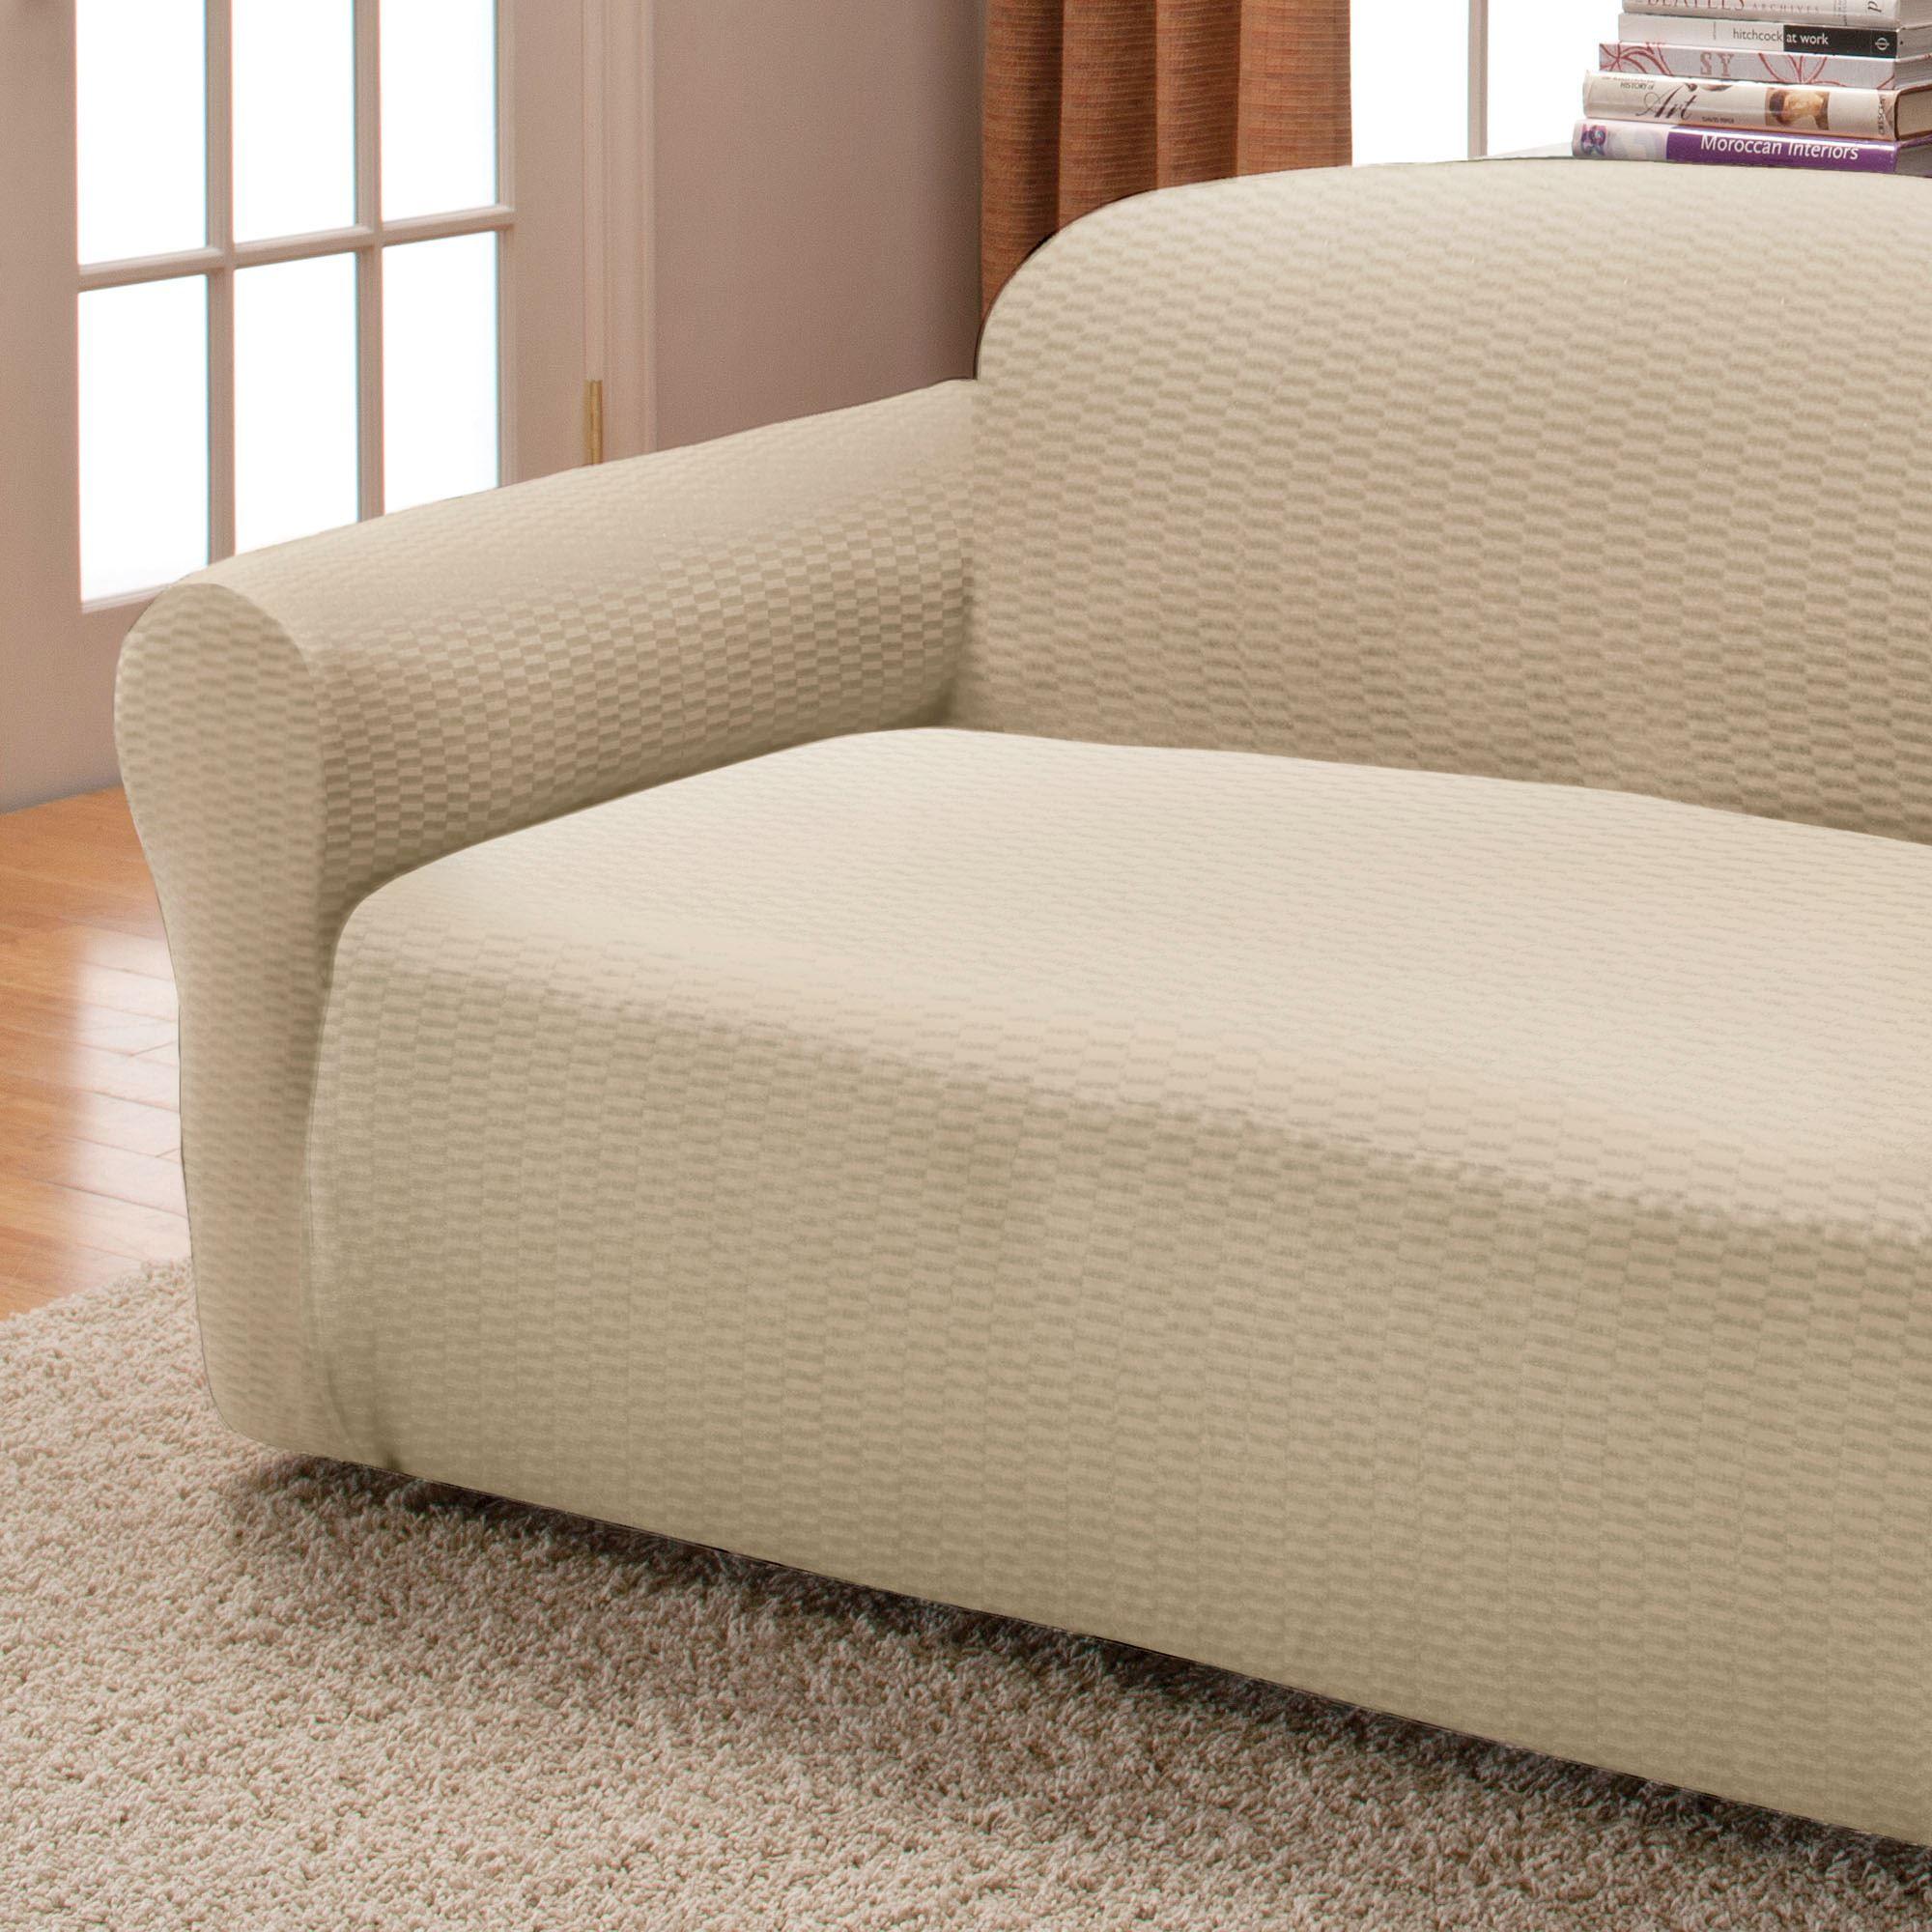 Raise The Bar Stretch Sofa Slipcovers